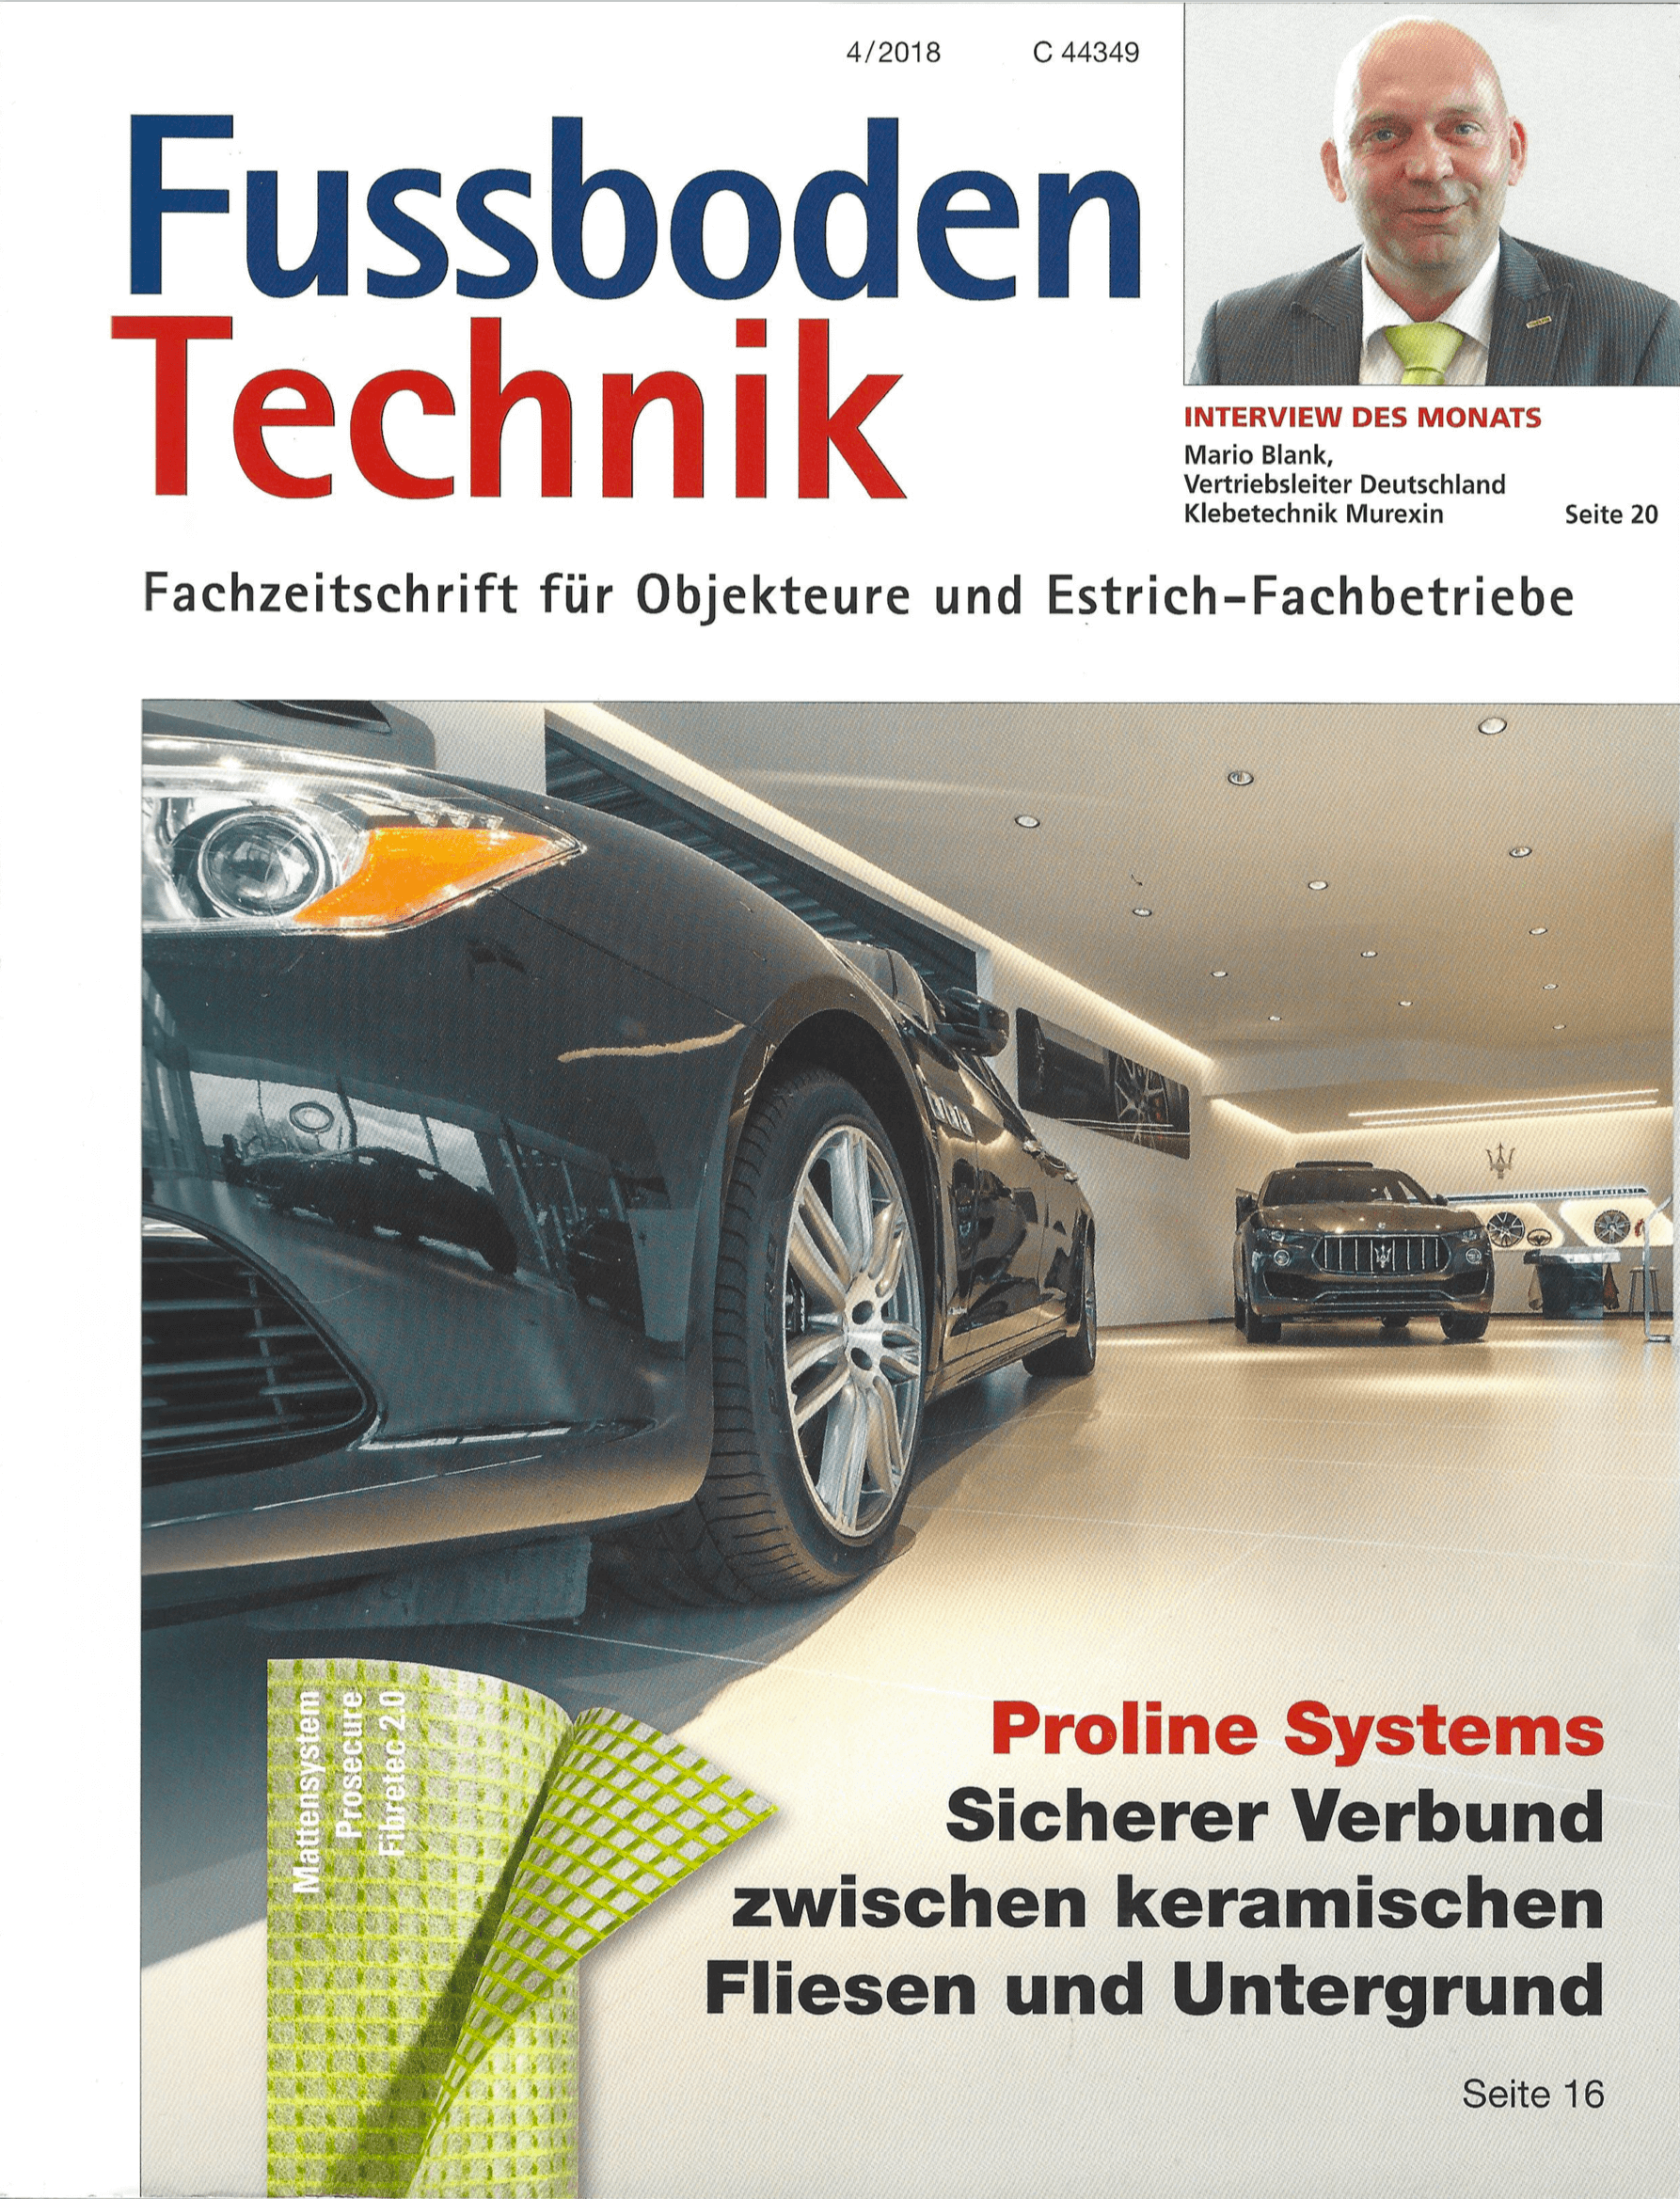 Fussboden Technik Zeitschrift